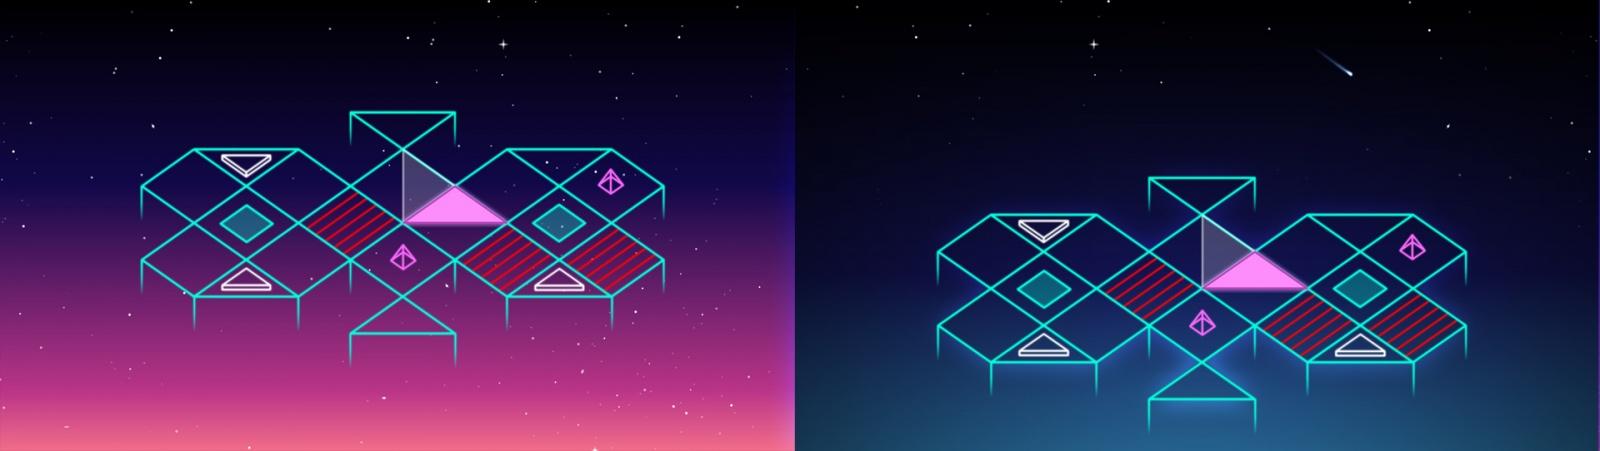 Игра-головоломка Neo Angle. Продолжение истории разработки и релиз в Appstore - 6